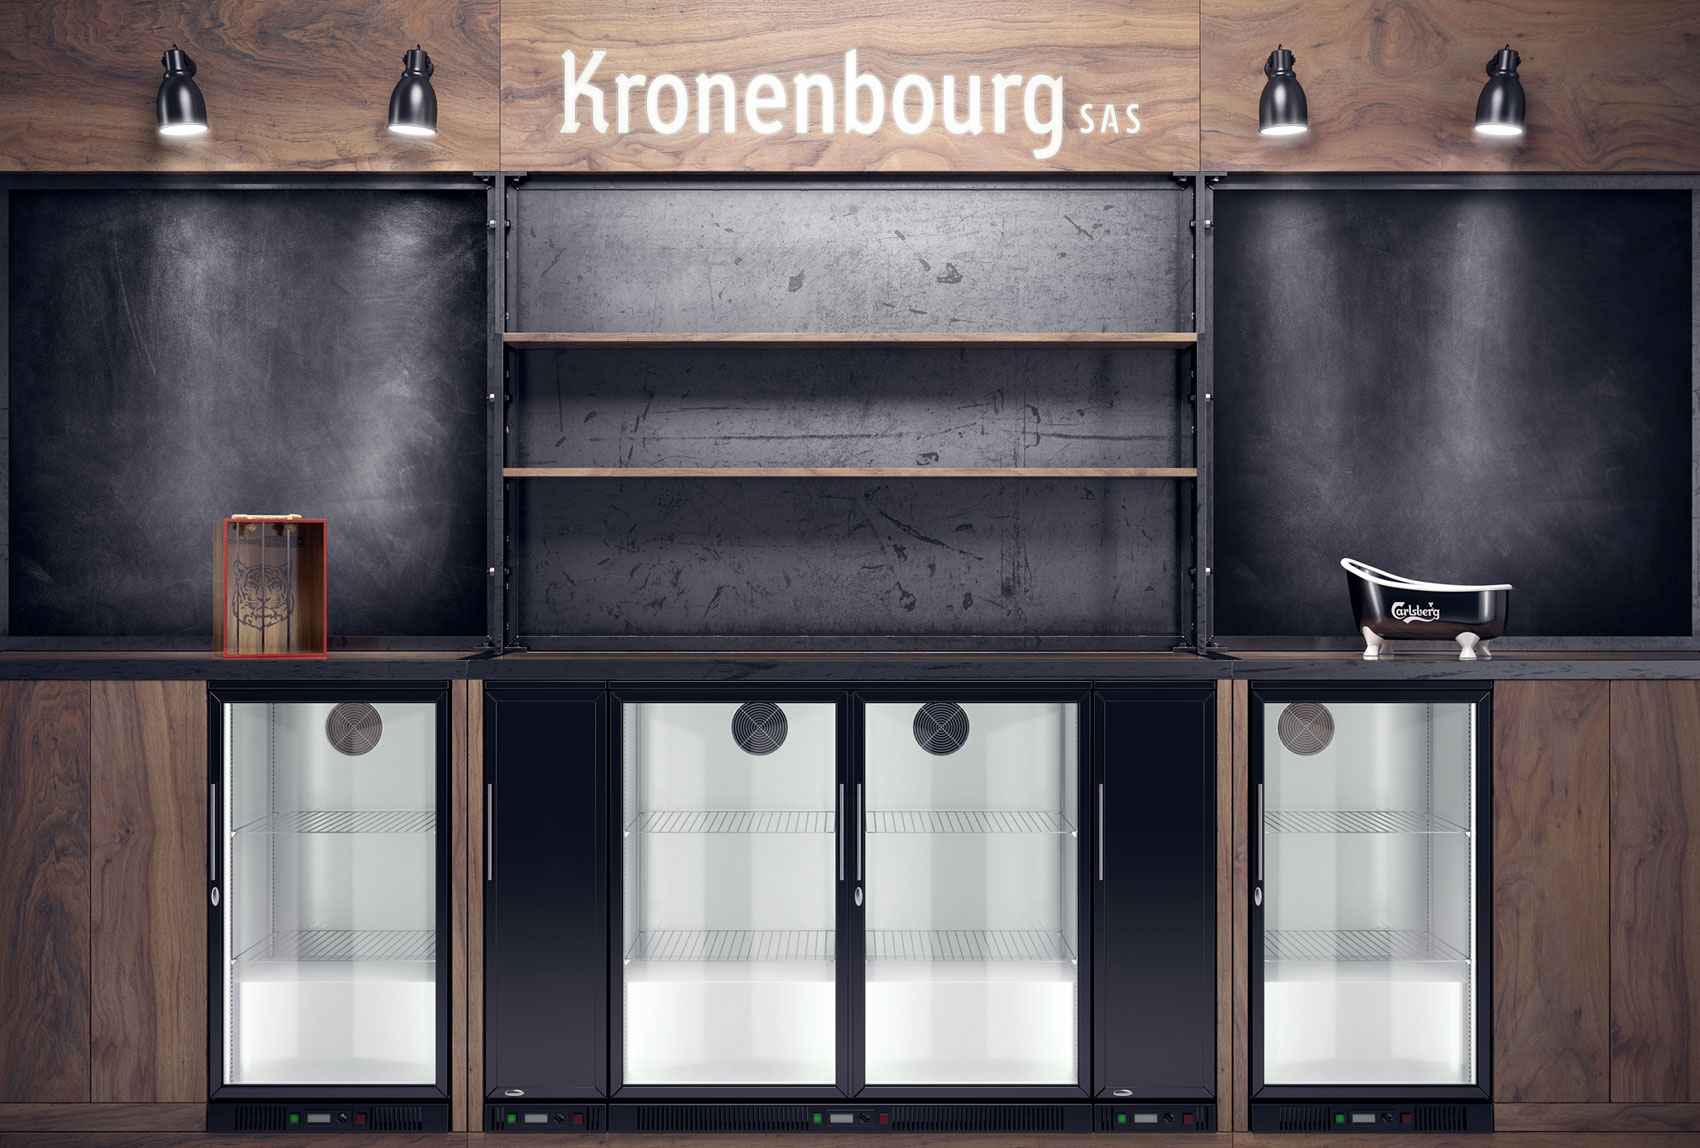 multi-marques-kronenbourg-2